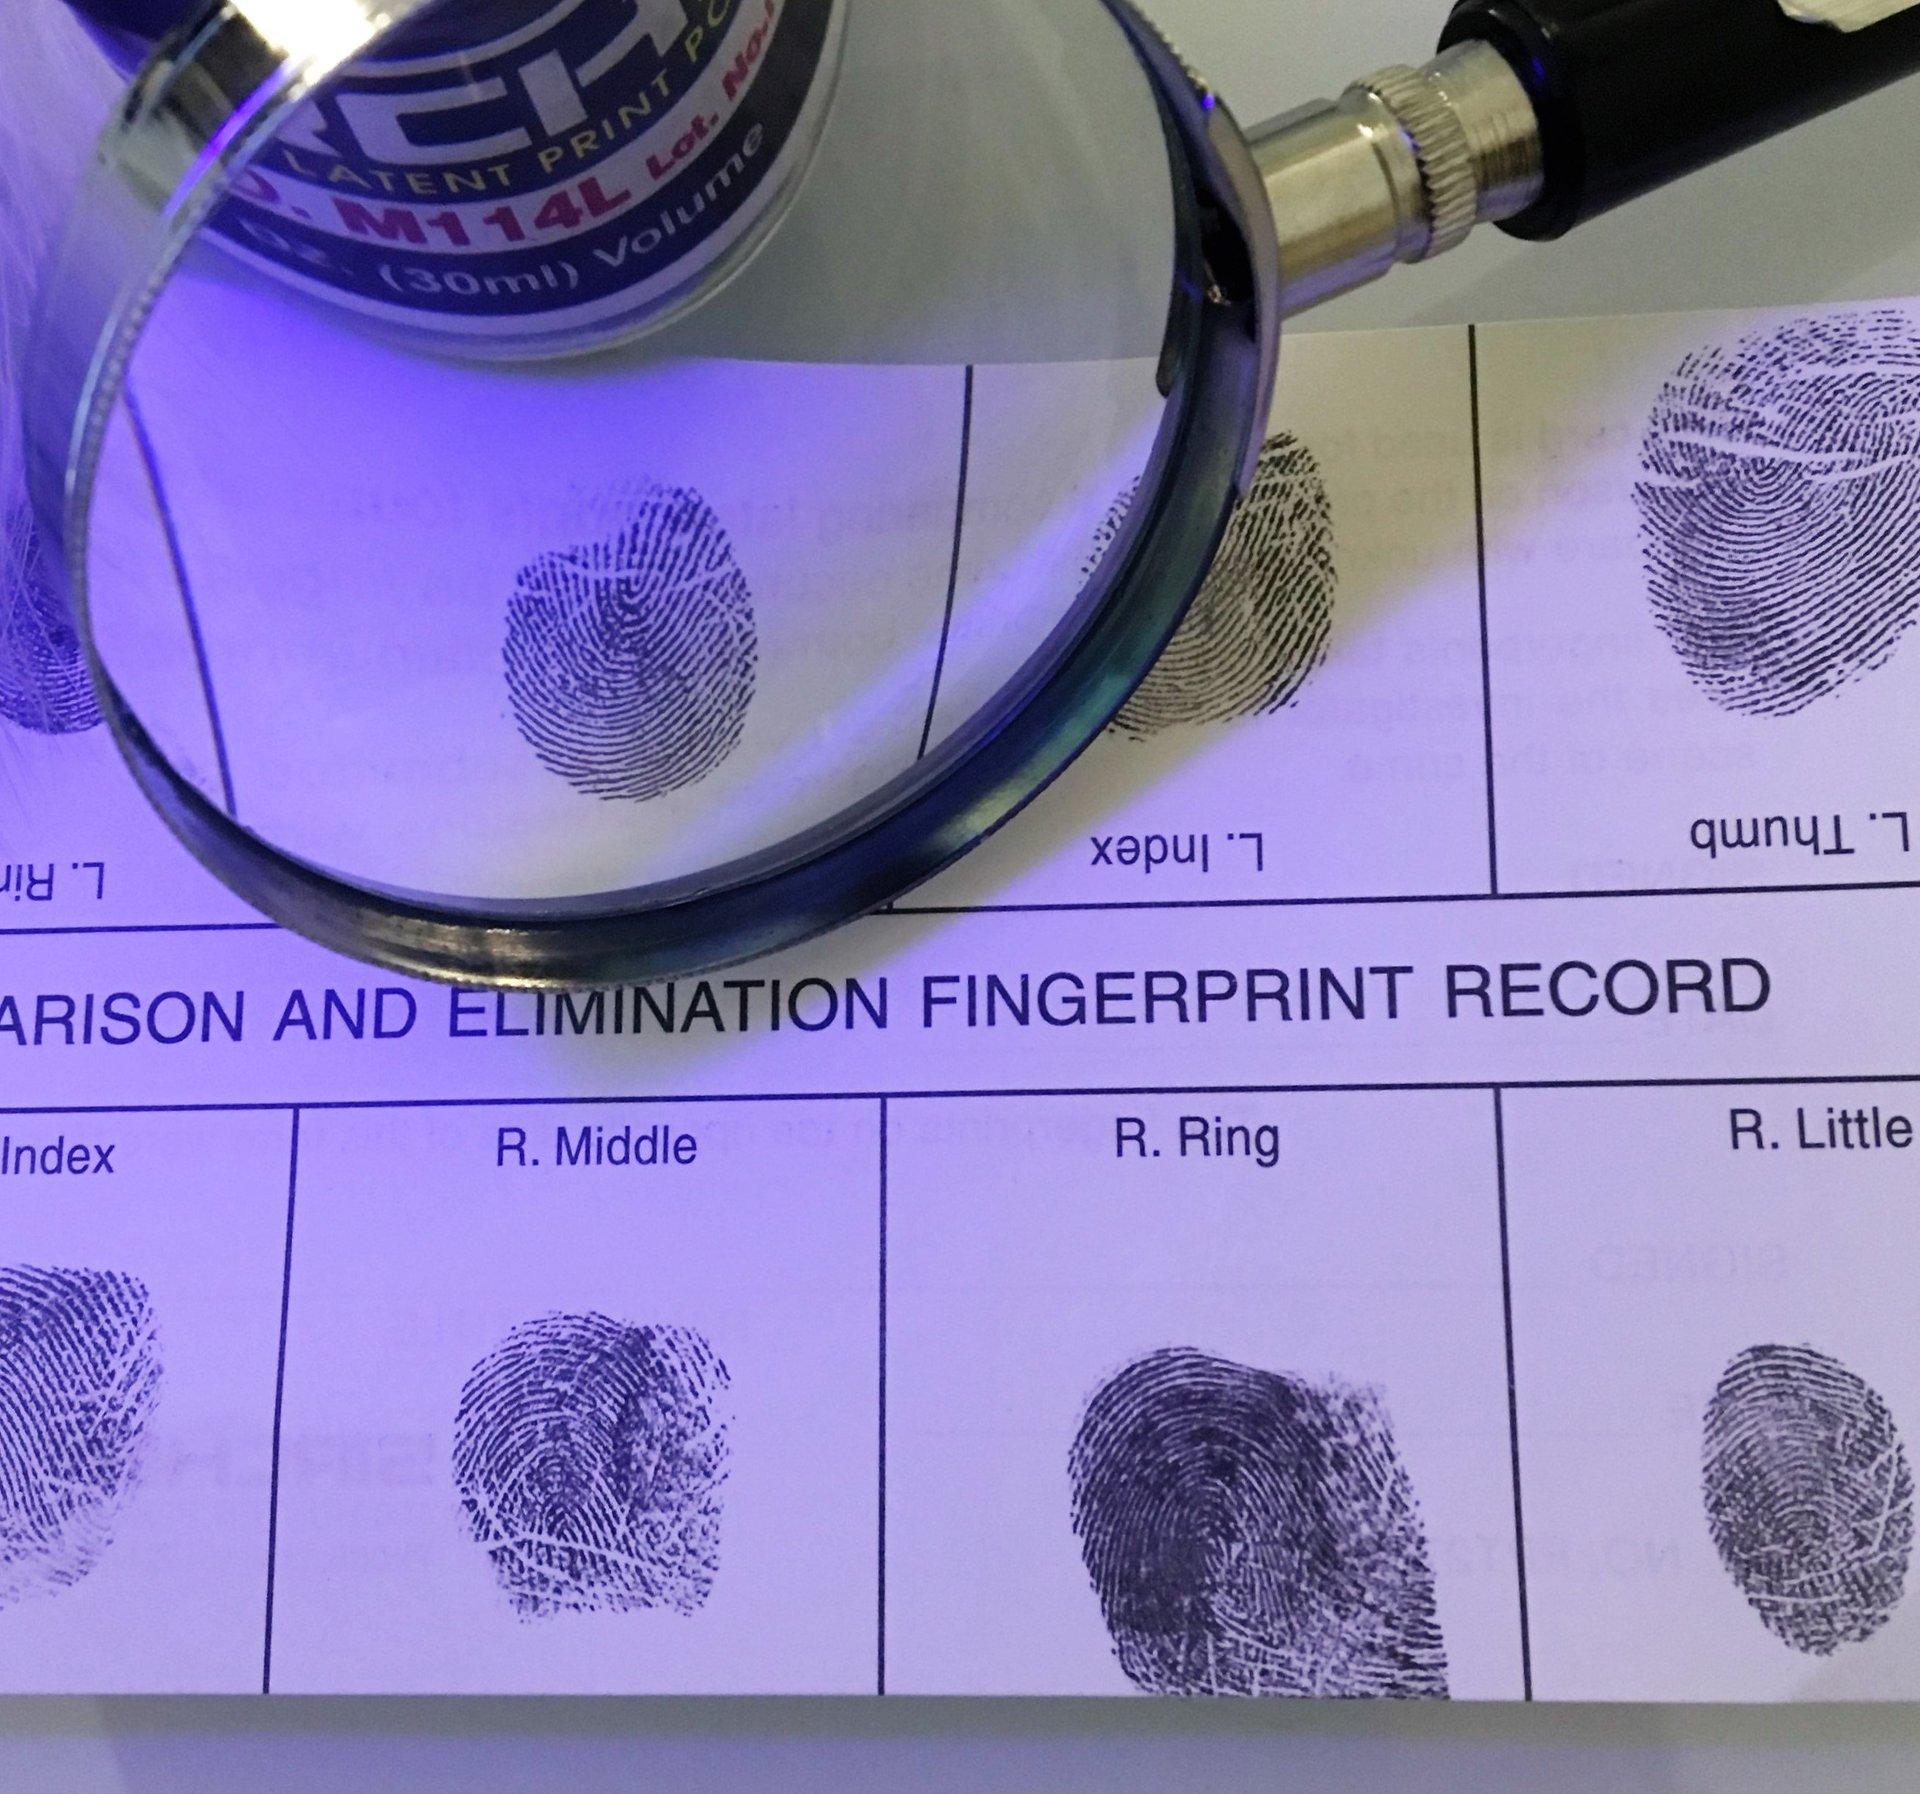 impronte digitali schedate